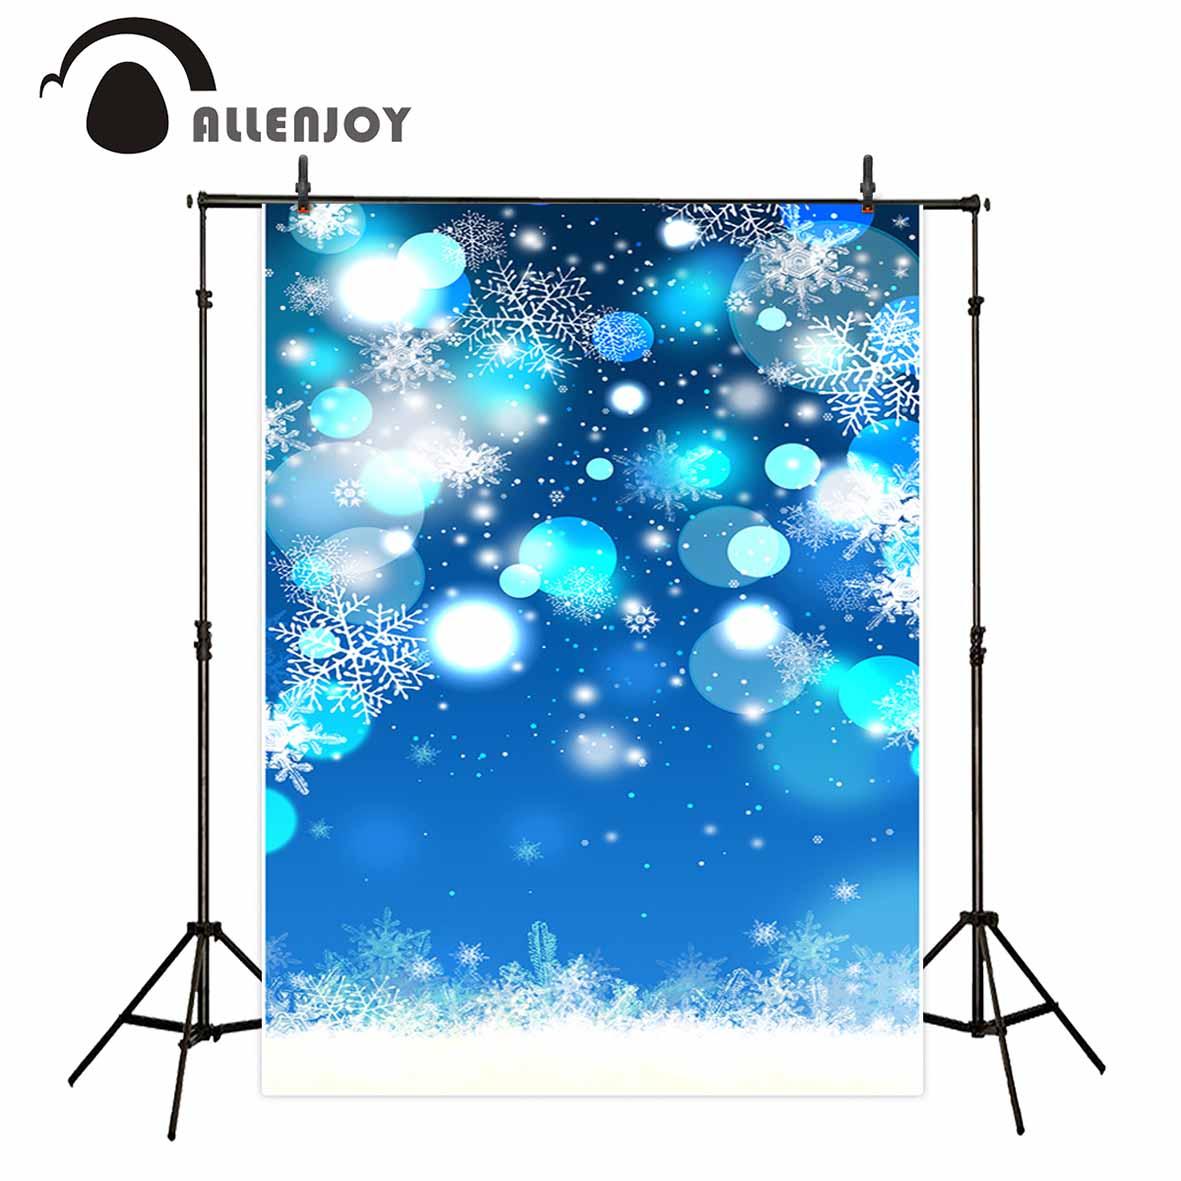 Allenjoy photography backdrop blue snowflake bokeh halo dot winter Christmas background original design vinyl cloth fabric